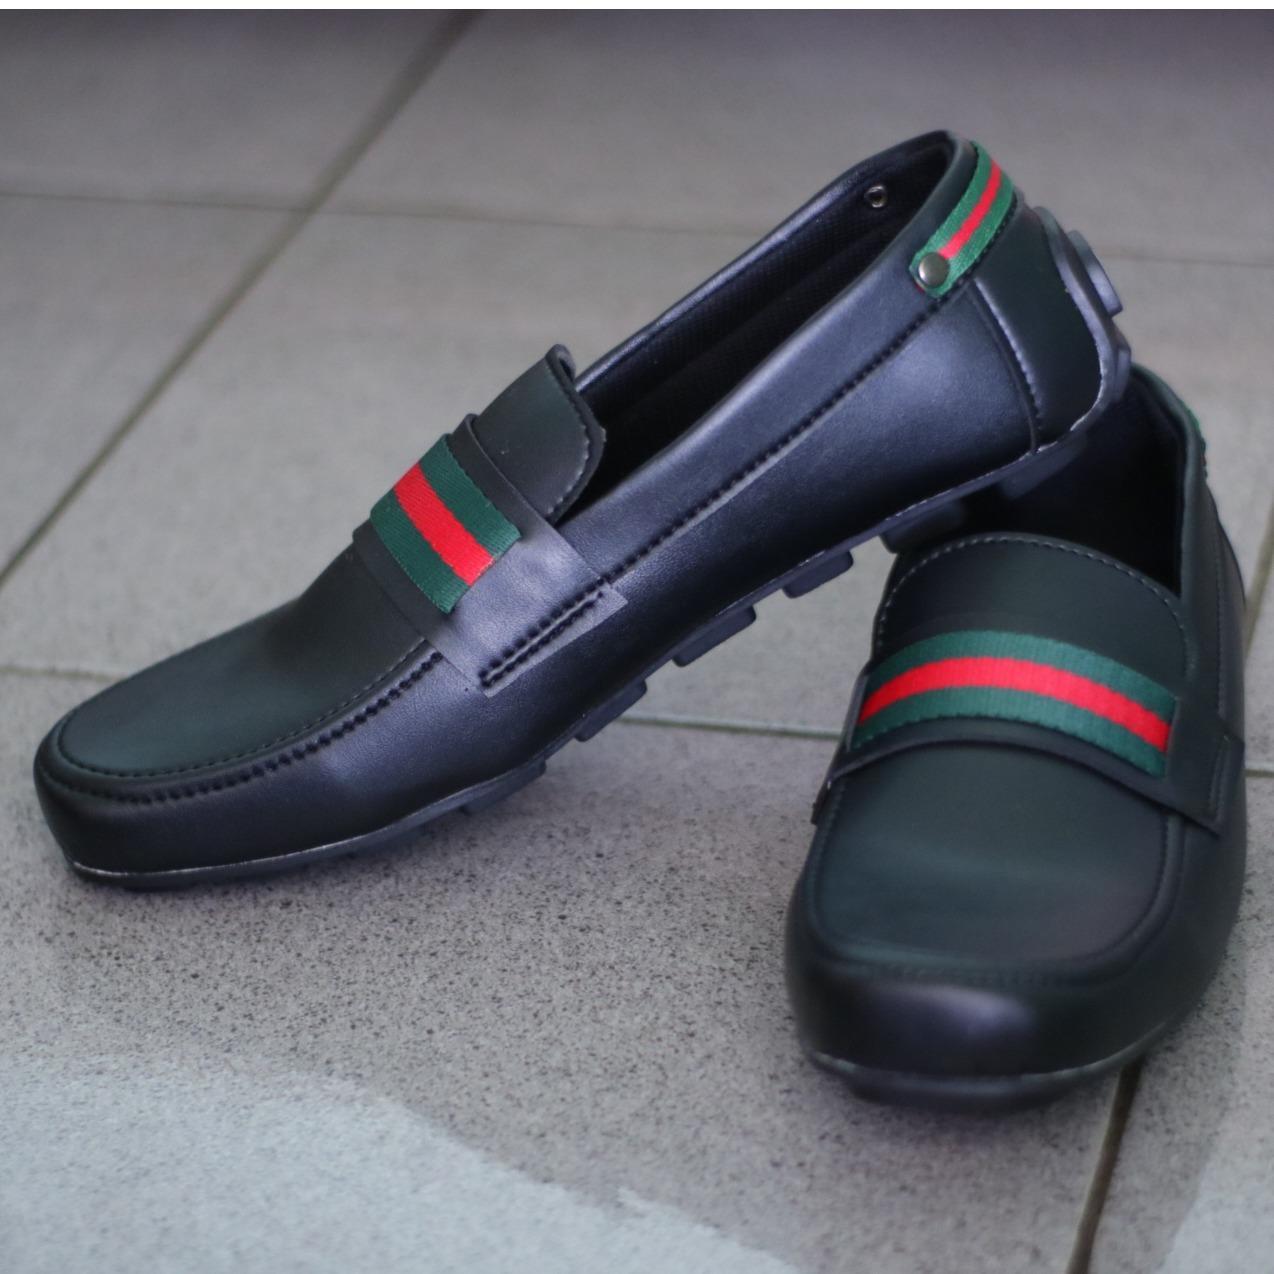 Sepatu Slip-on (Guci) Gucci Pria dan Kasual Pria - Multi Polos (Lokal)